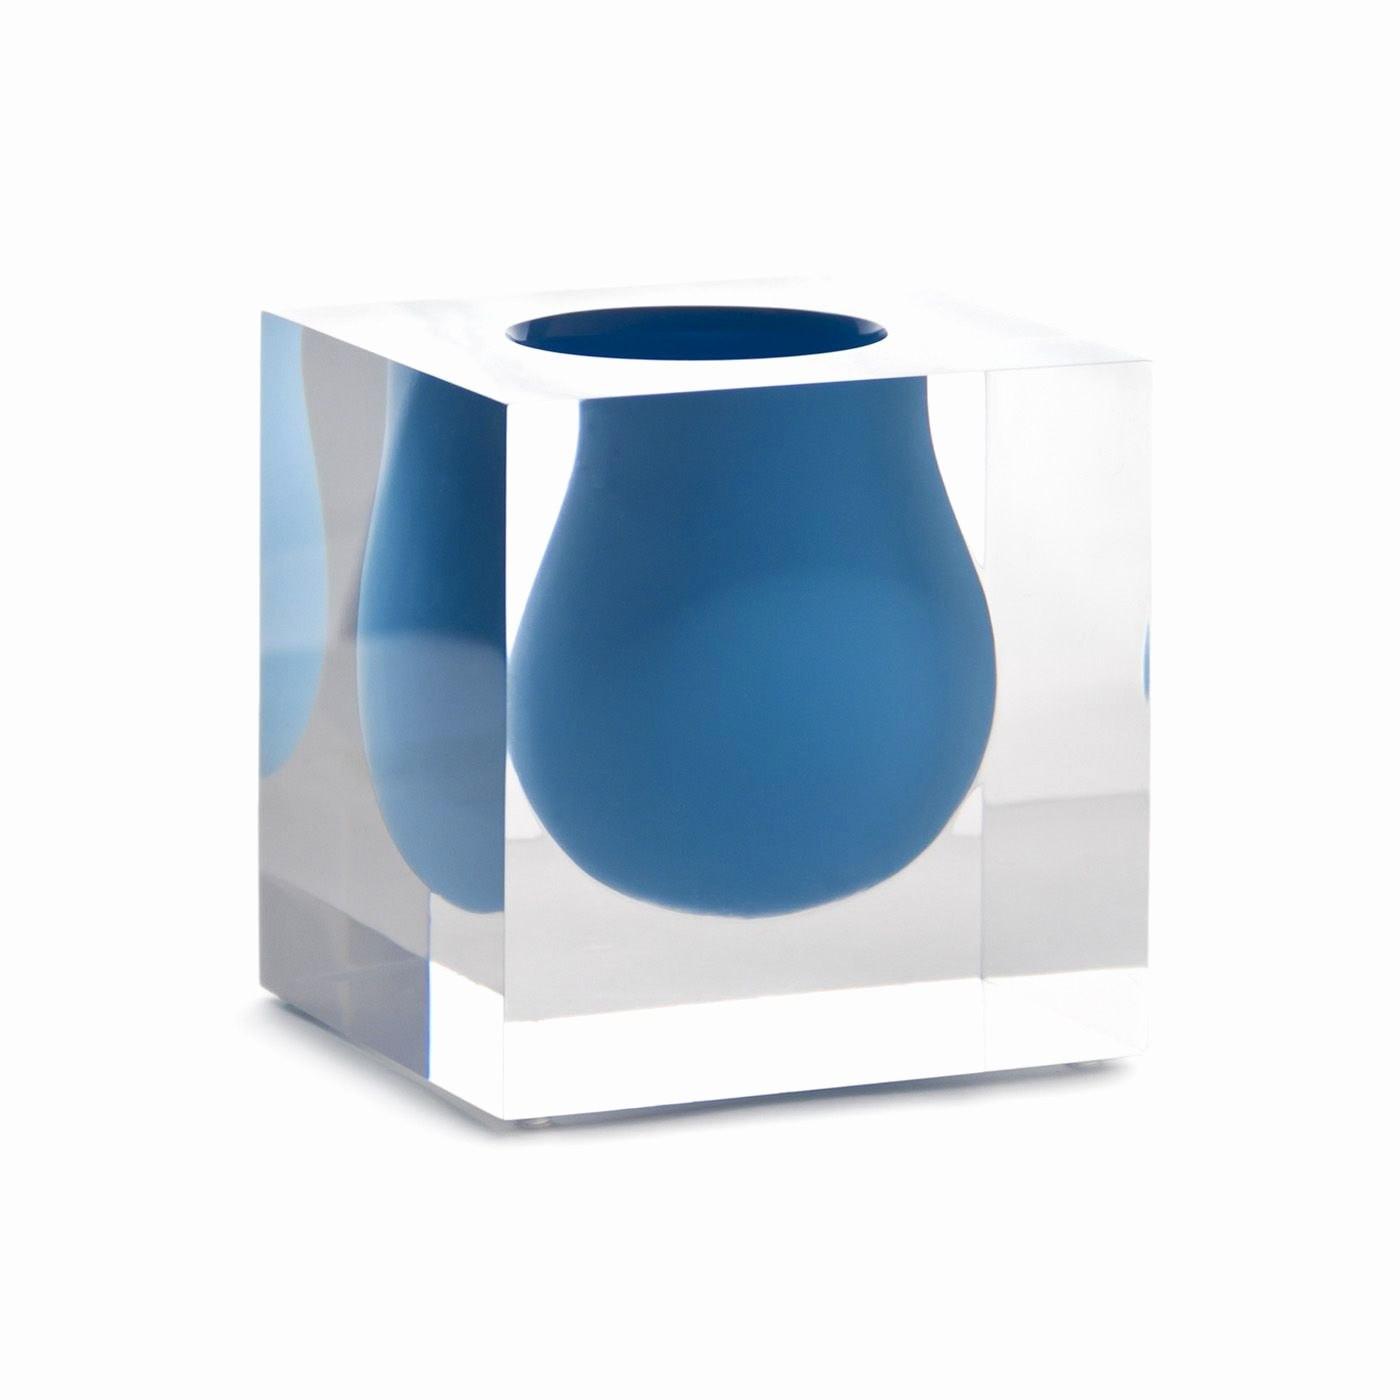 cobalt blue pottery vase of 20 unique very tall decorative vases bogekompresorturkiye com with regard to vases for home decor unique home decor vases unique d dkbrw 5743 1h vases tall wood